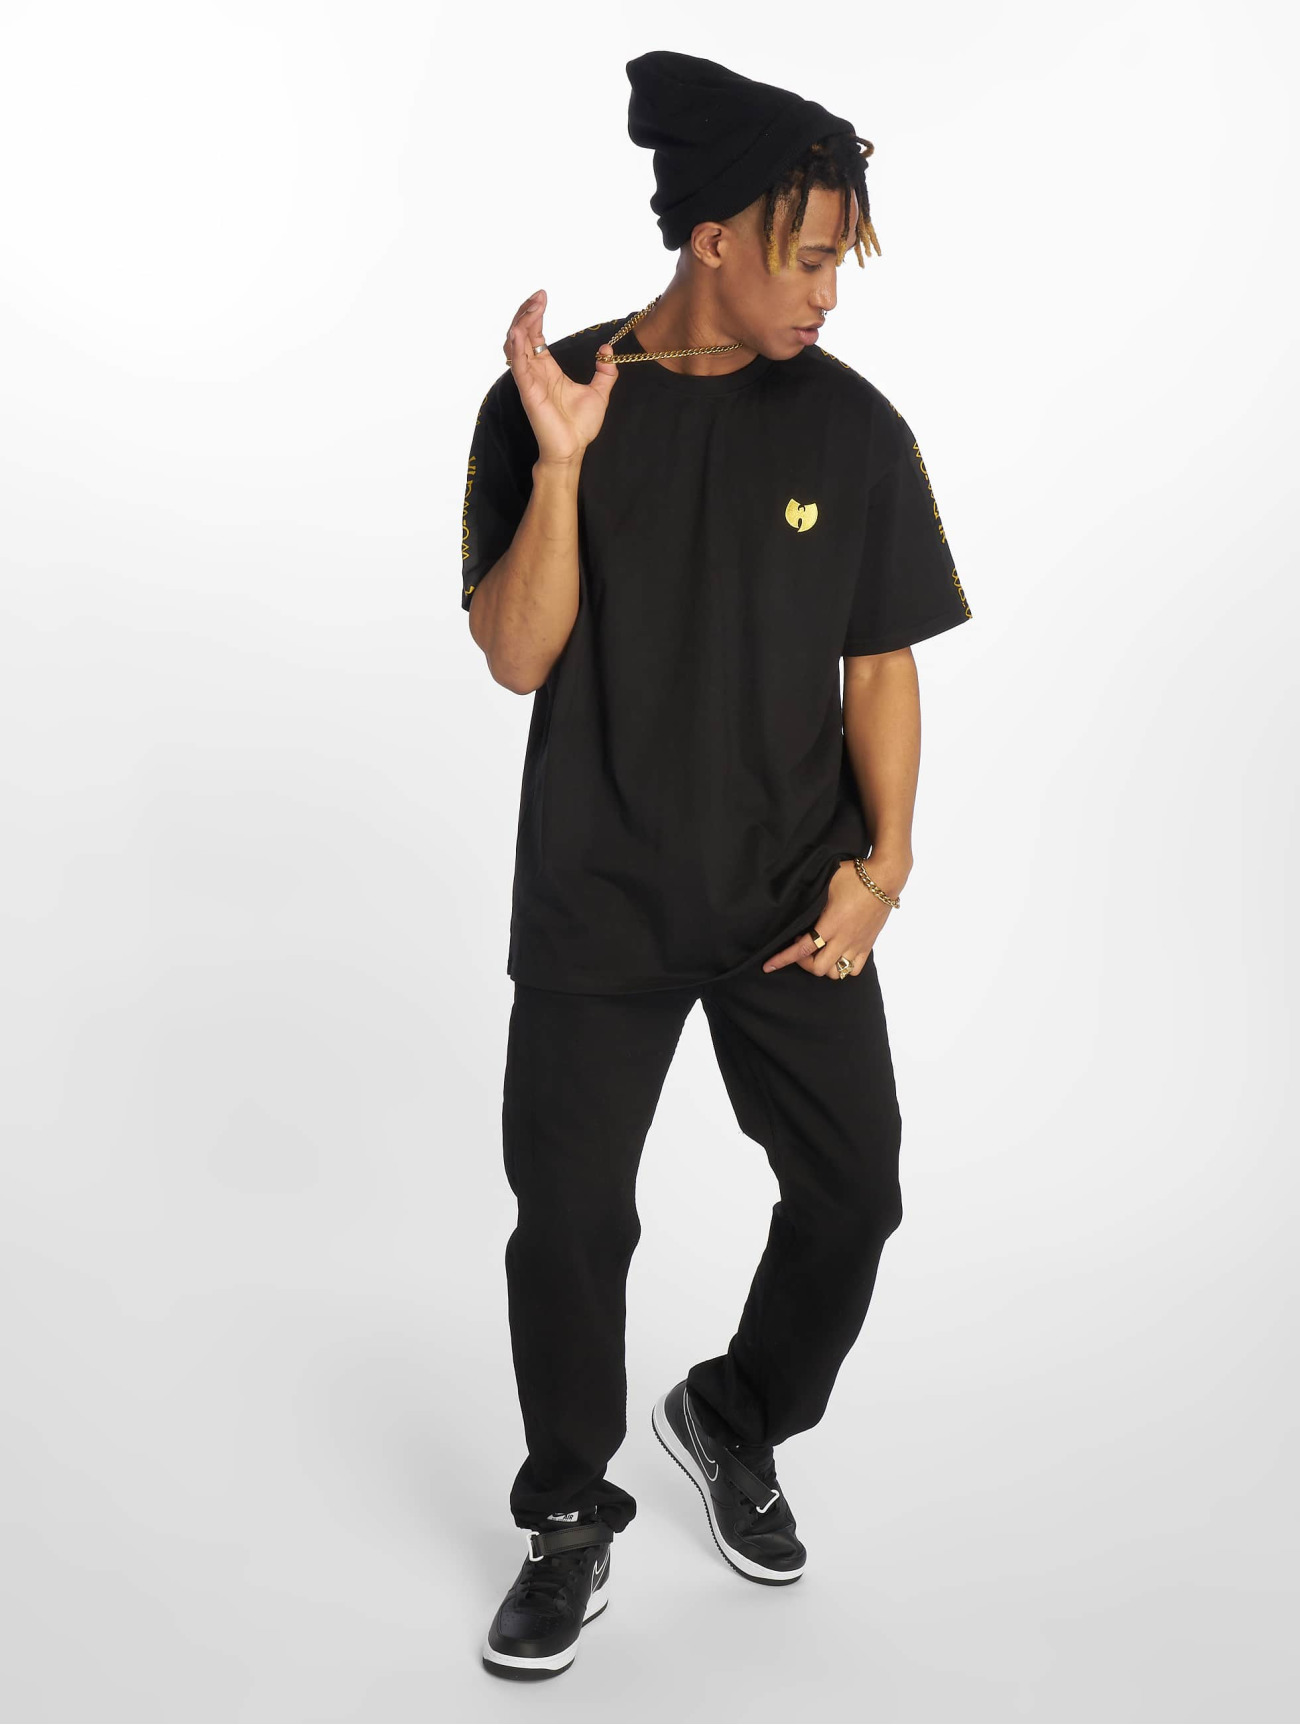 Wu-Tang | Sidetape  noir Homme T-Shirt  574443| Homme Hauts